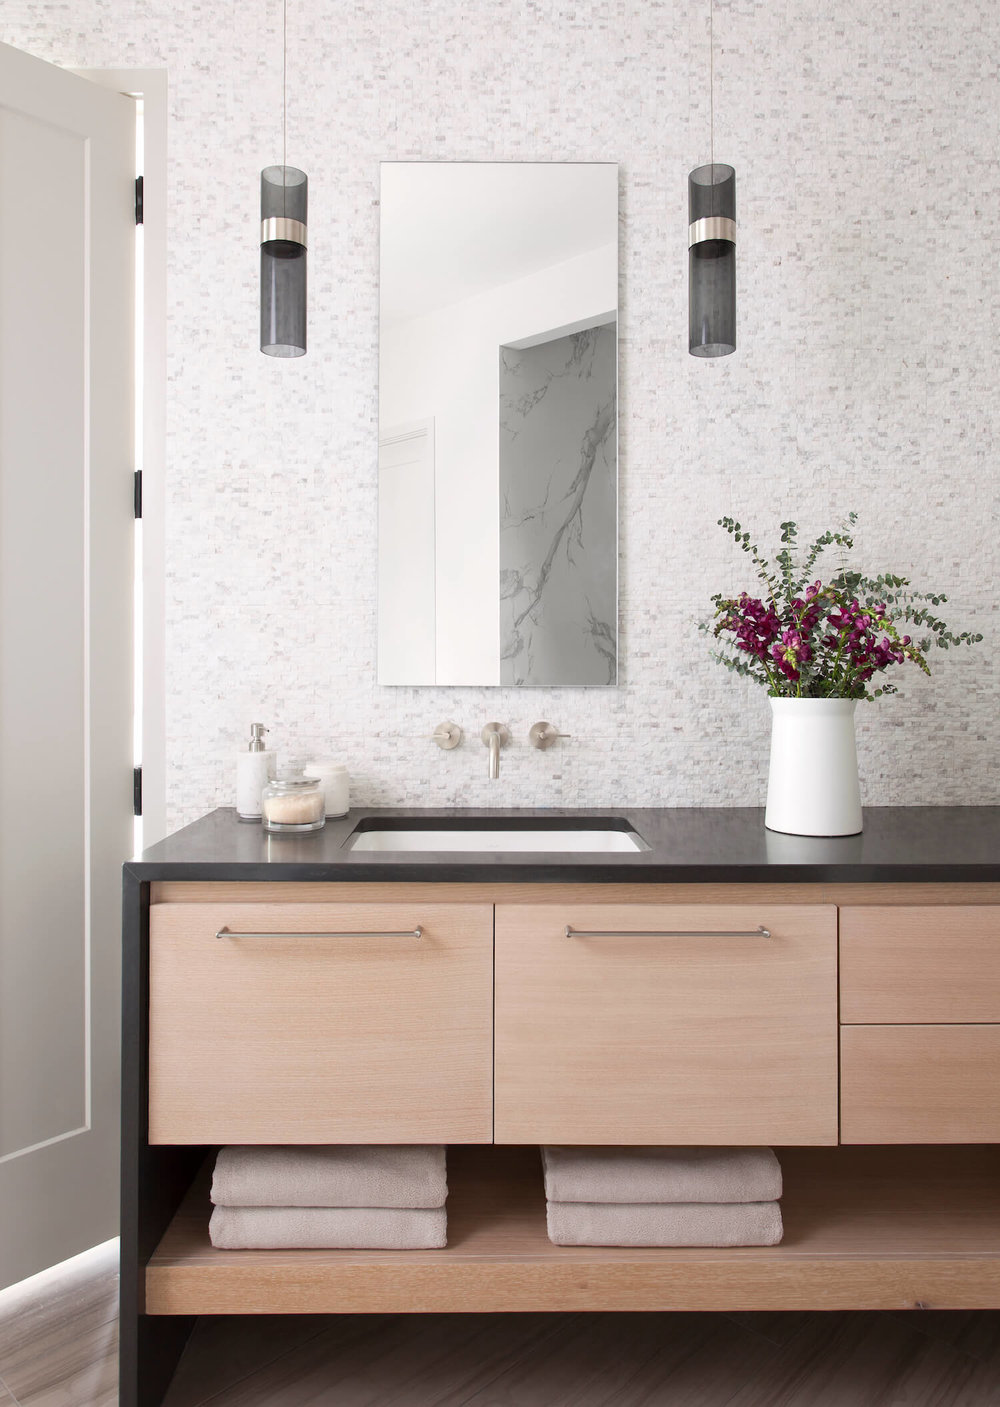 Horseshoe Bay Master Bathroom | Robin Colton Interior Design Studio Austin Texas | www.robincolton.com